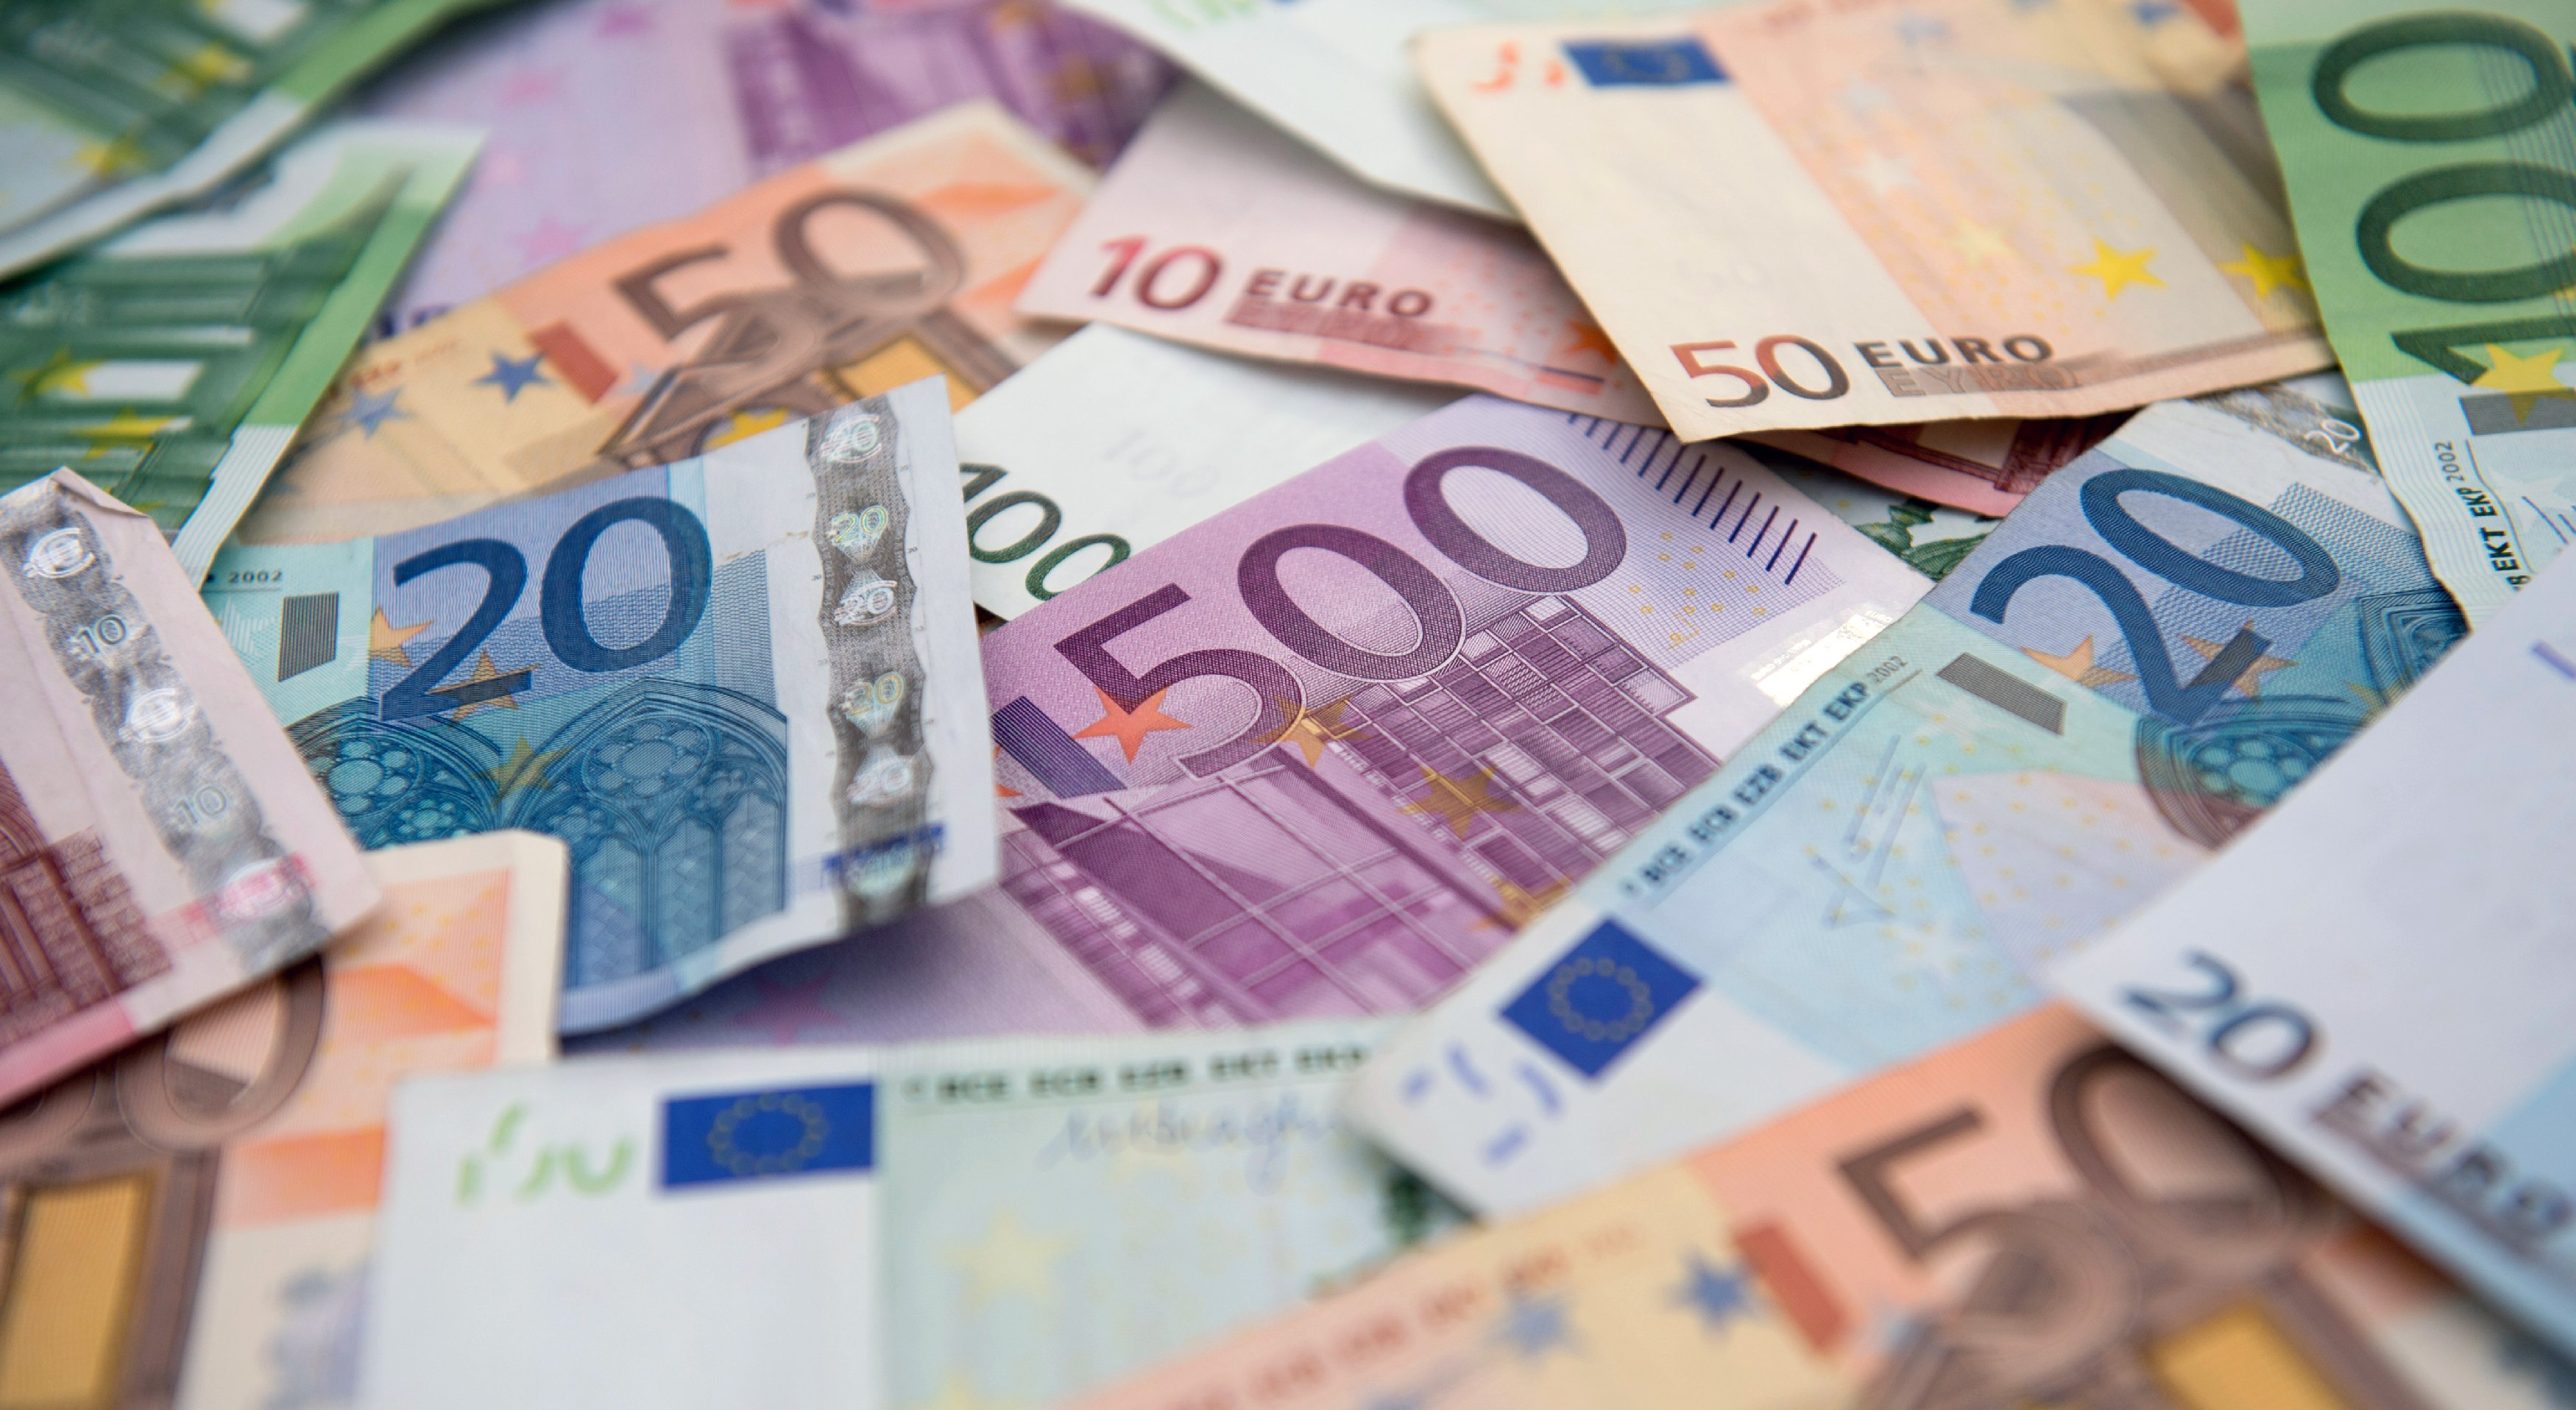 Центробанки еврозоны за 10 лет скупили активов на миллиарды евро